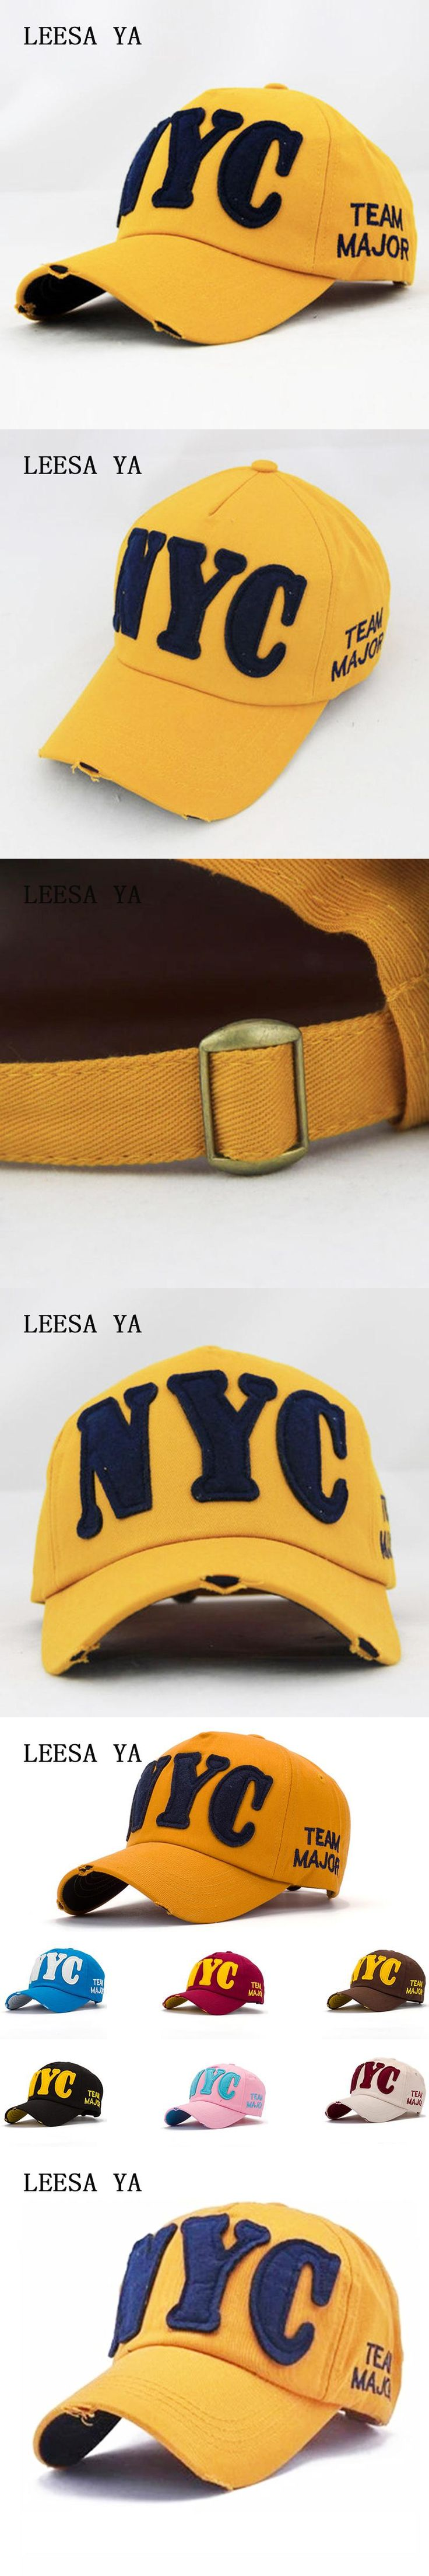 Fashion Cotton New York Baseball Caps Men High Quality Snapback Caps Women Brand polo Hats Bone Gorro Fitted Visor Hats man